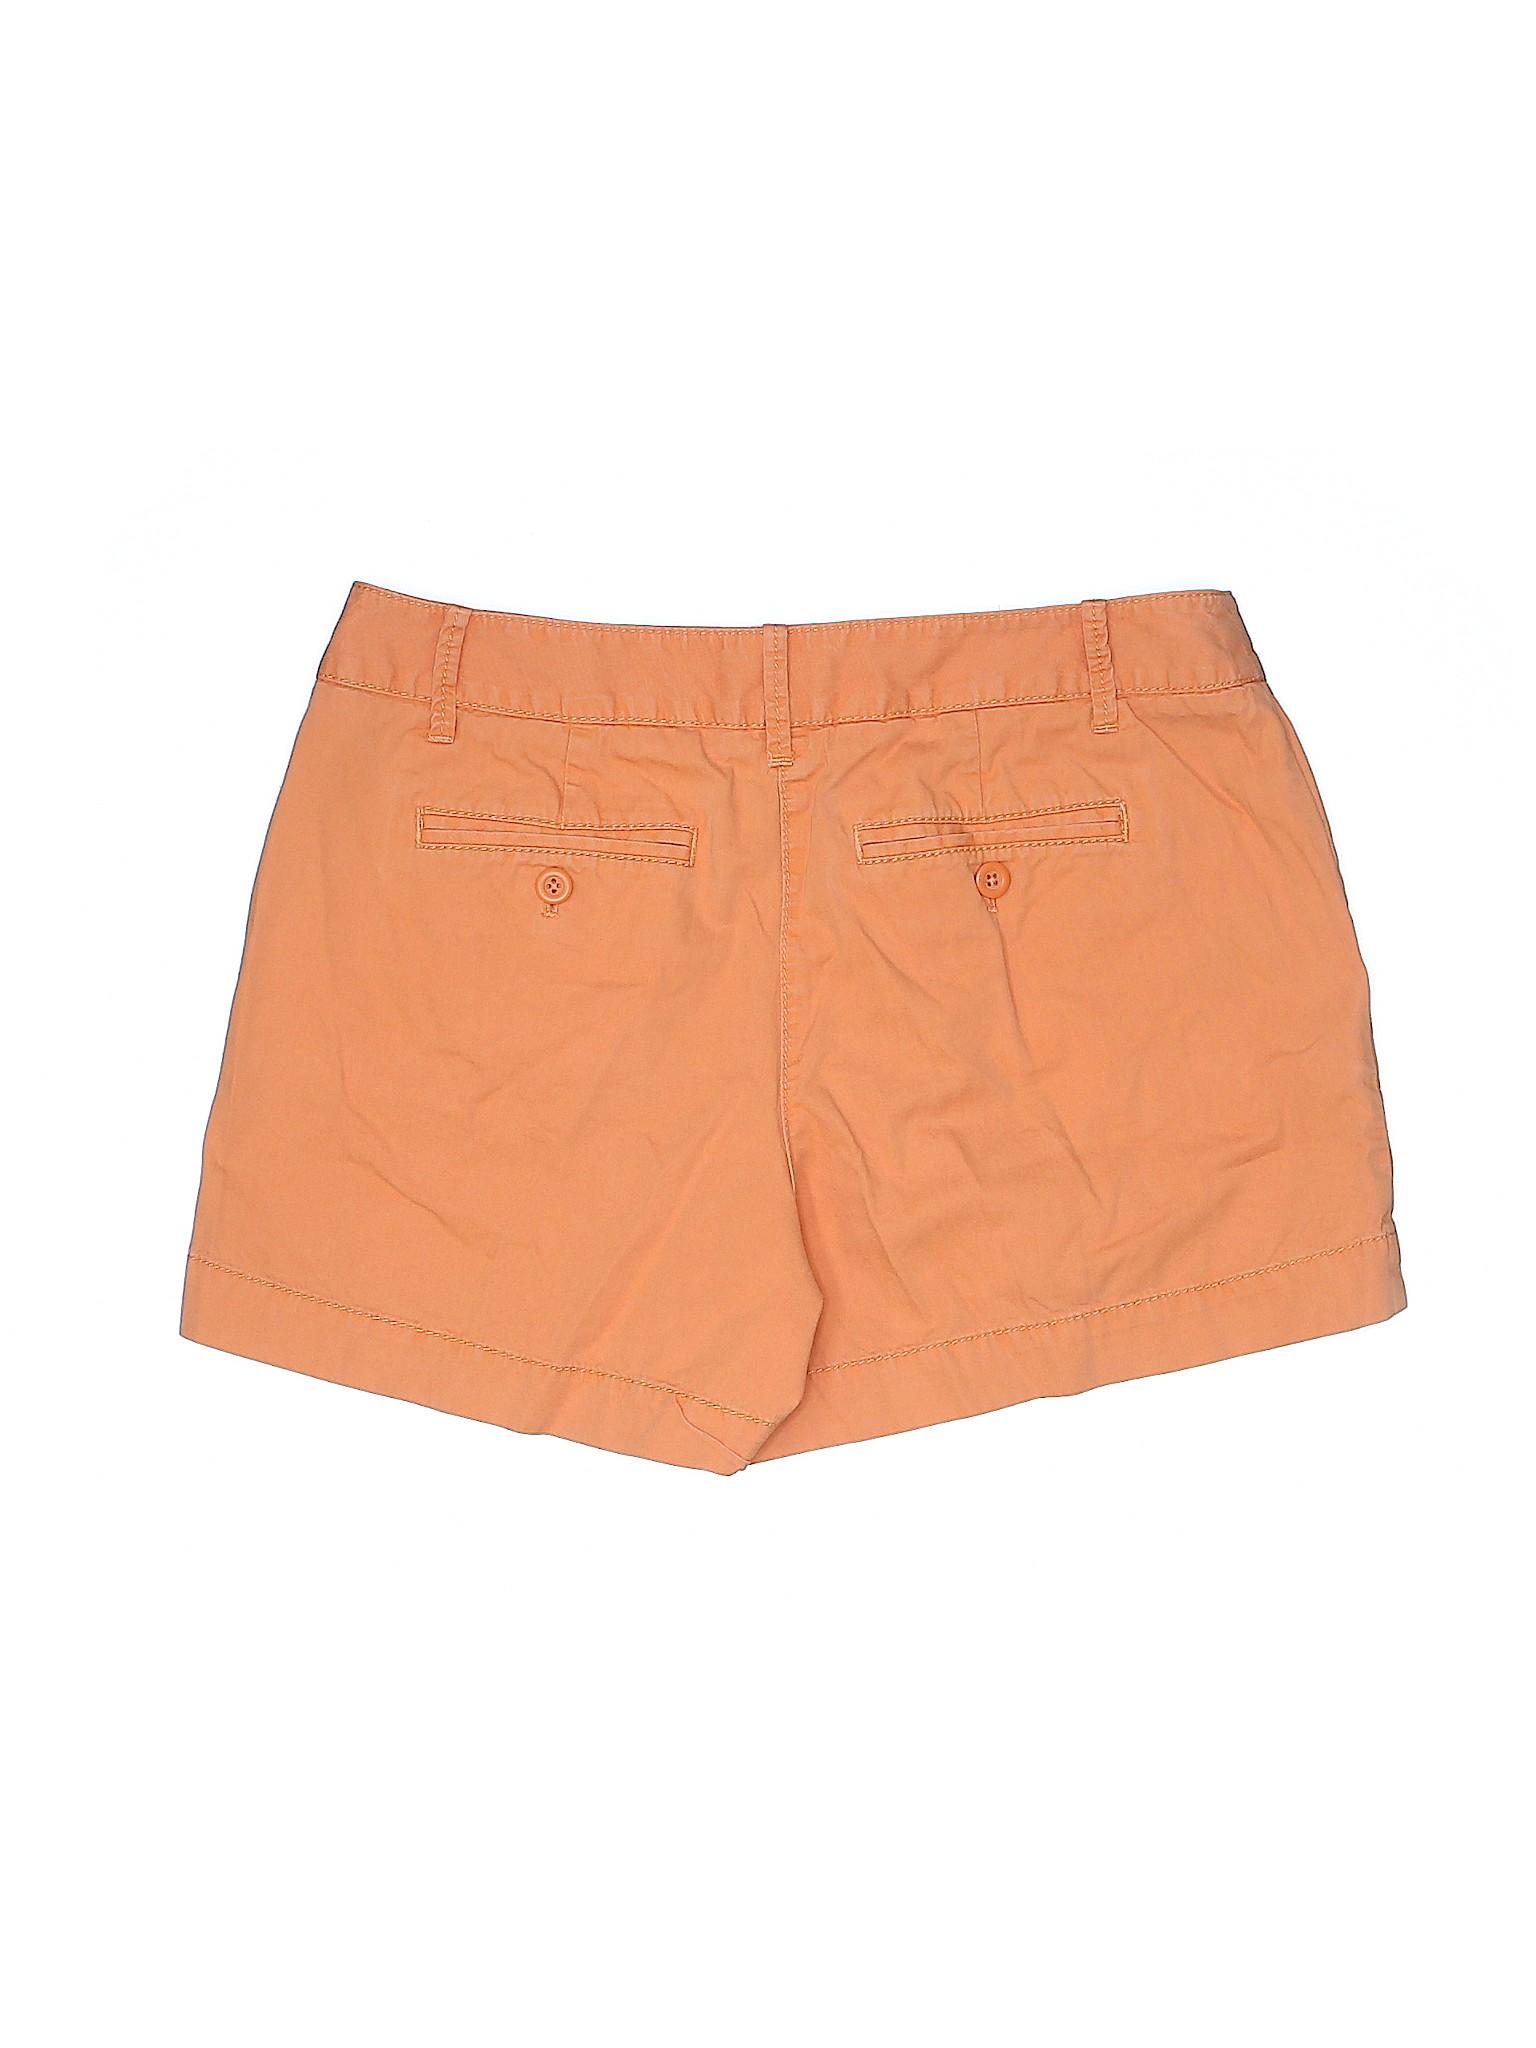 Boutique Shorts LOFT Ann Taylor Khaki axwqaArZ